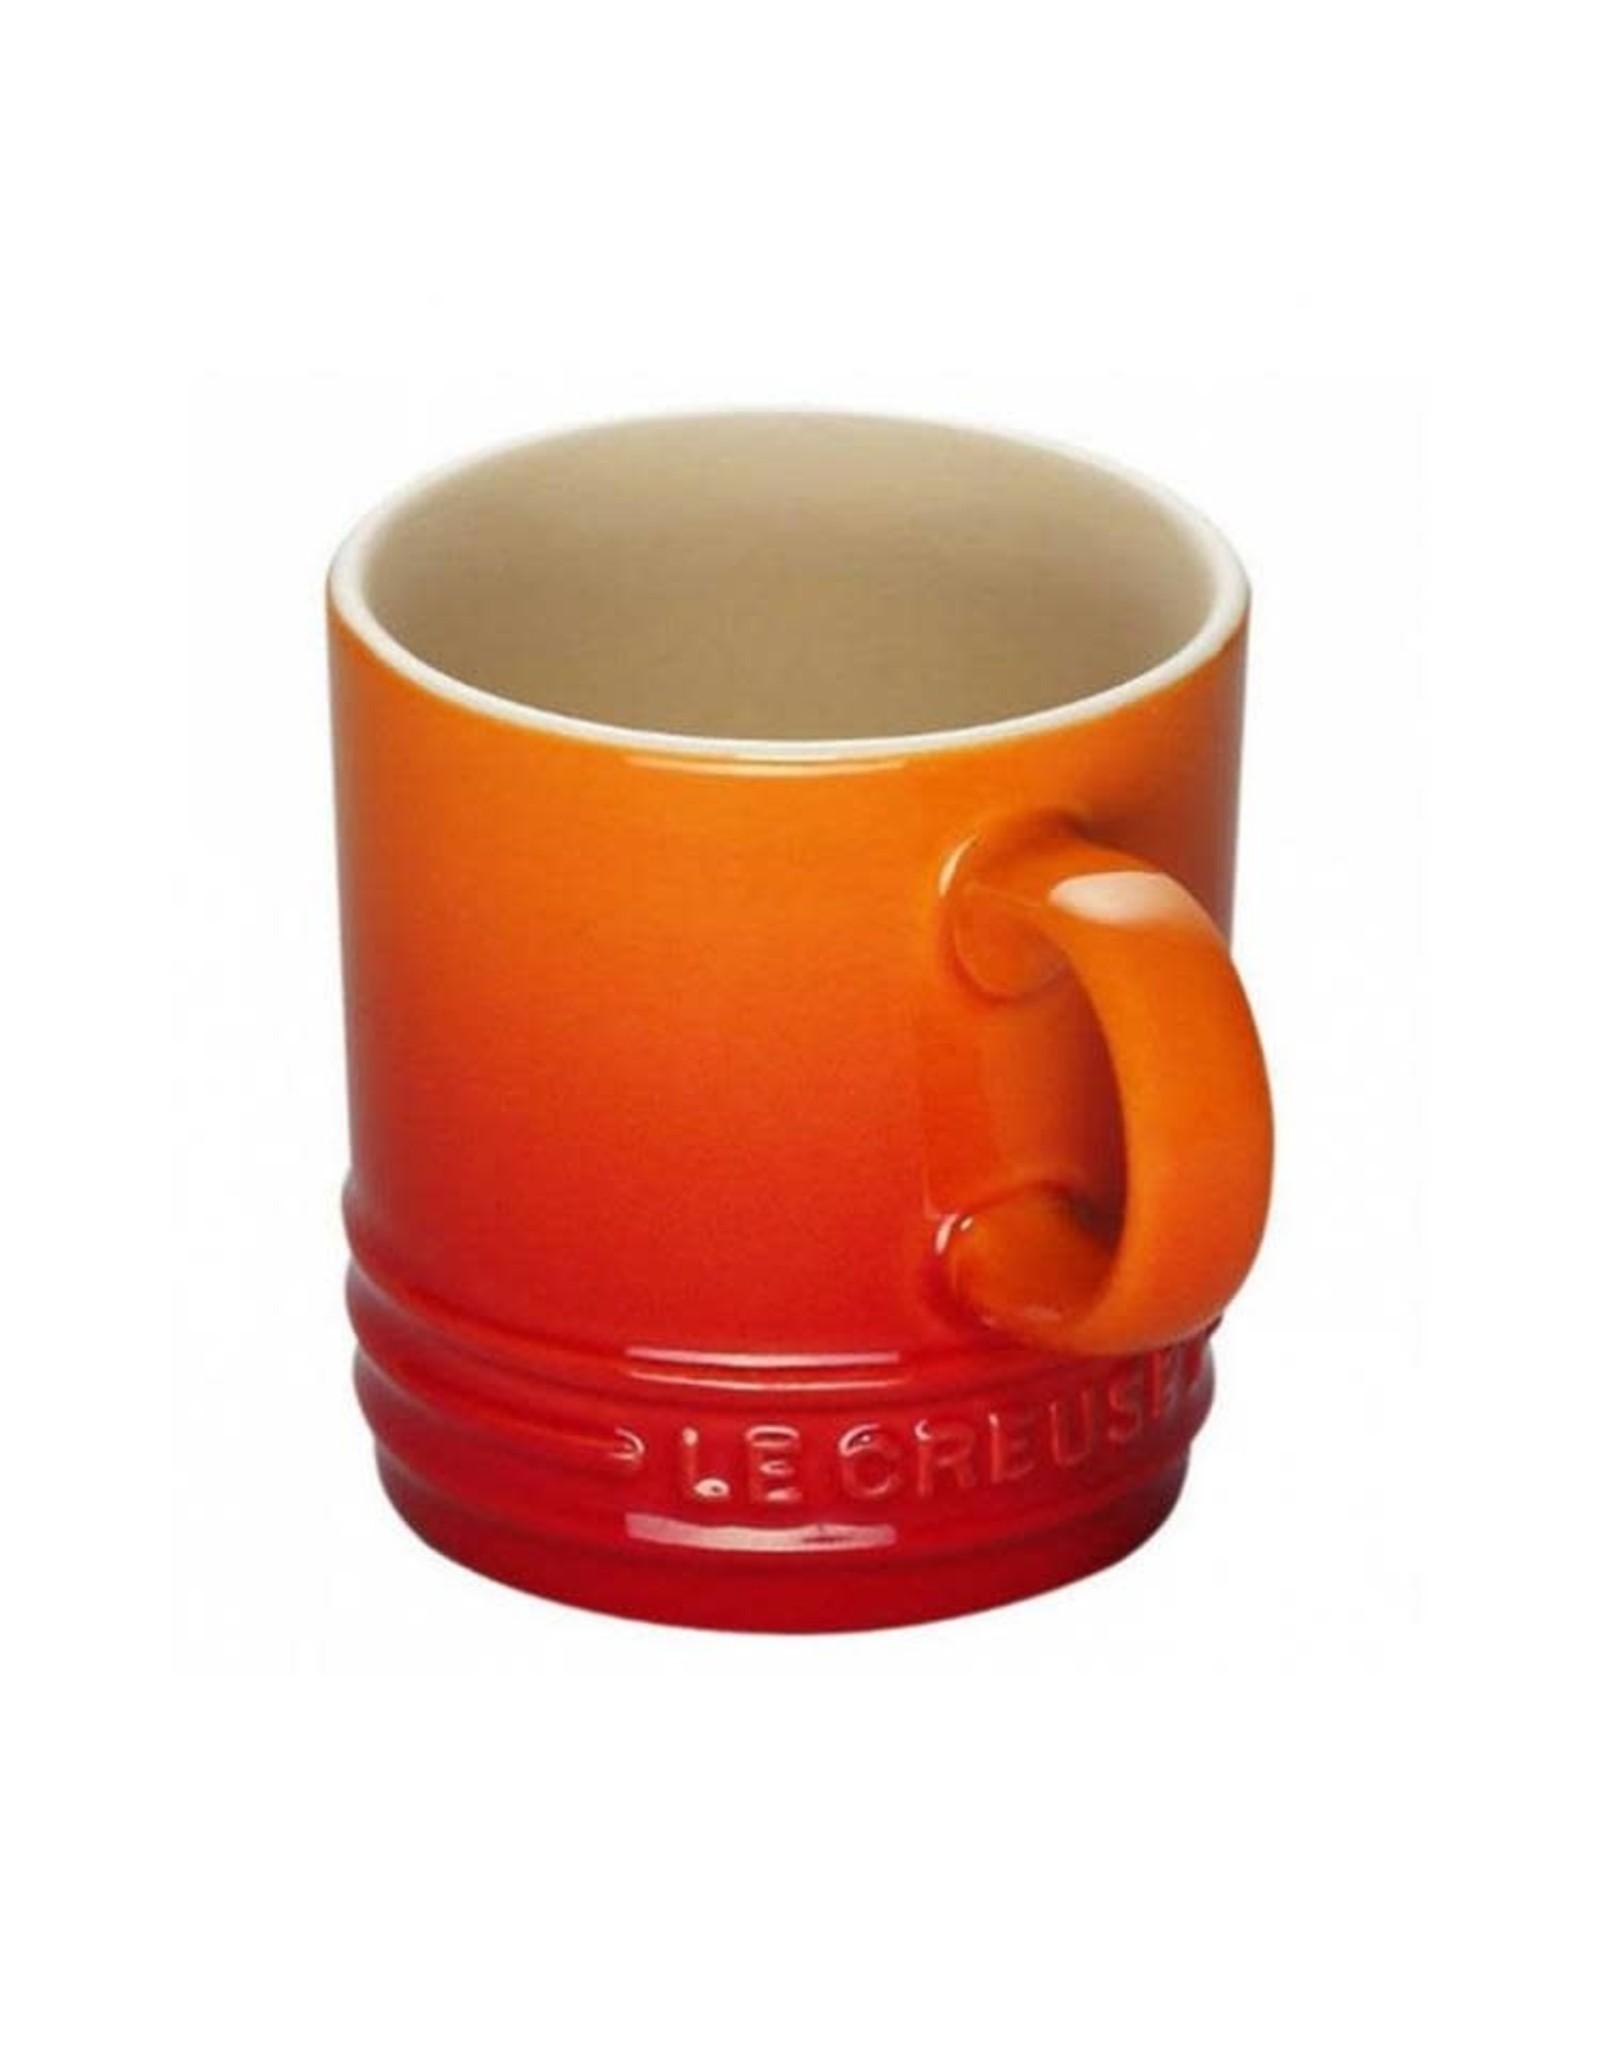 Le Creuset Mok 0,35 L Oranje-rood